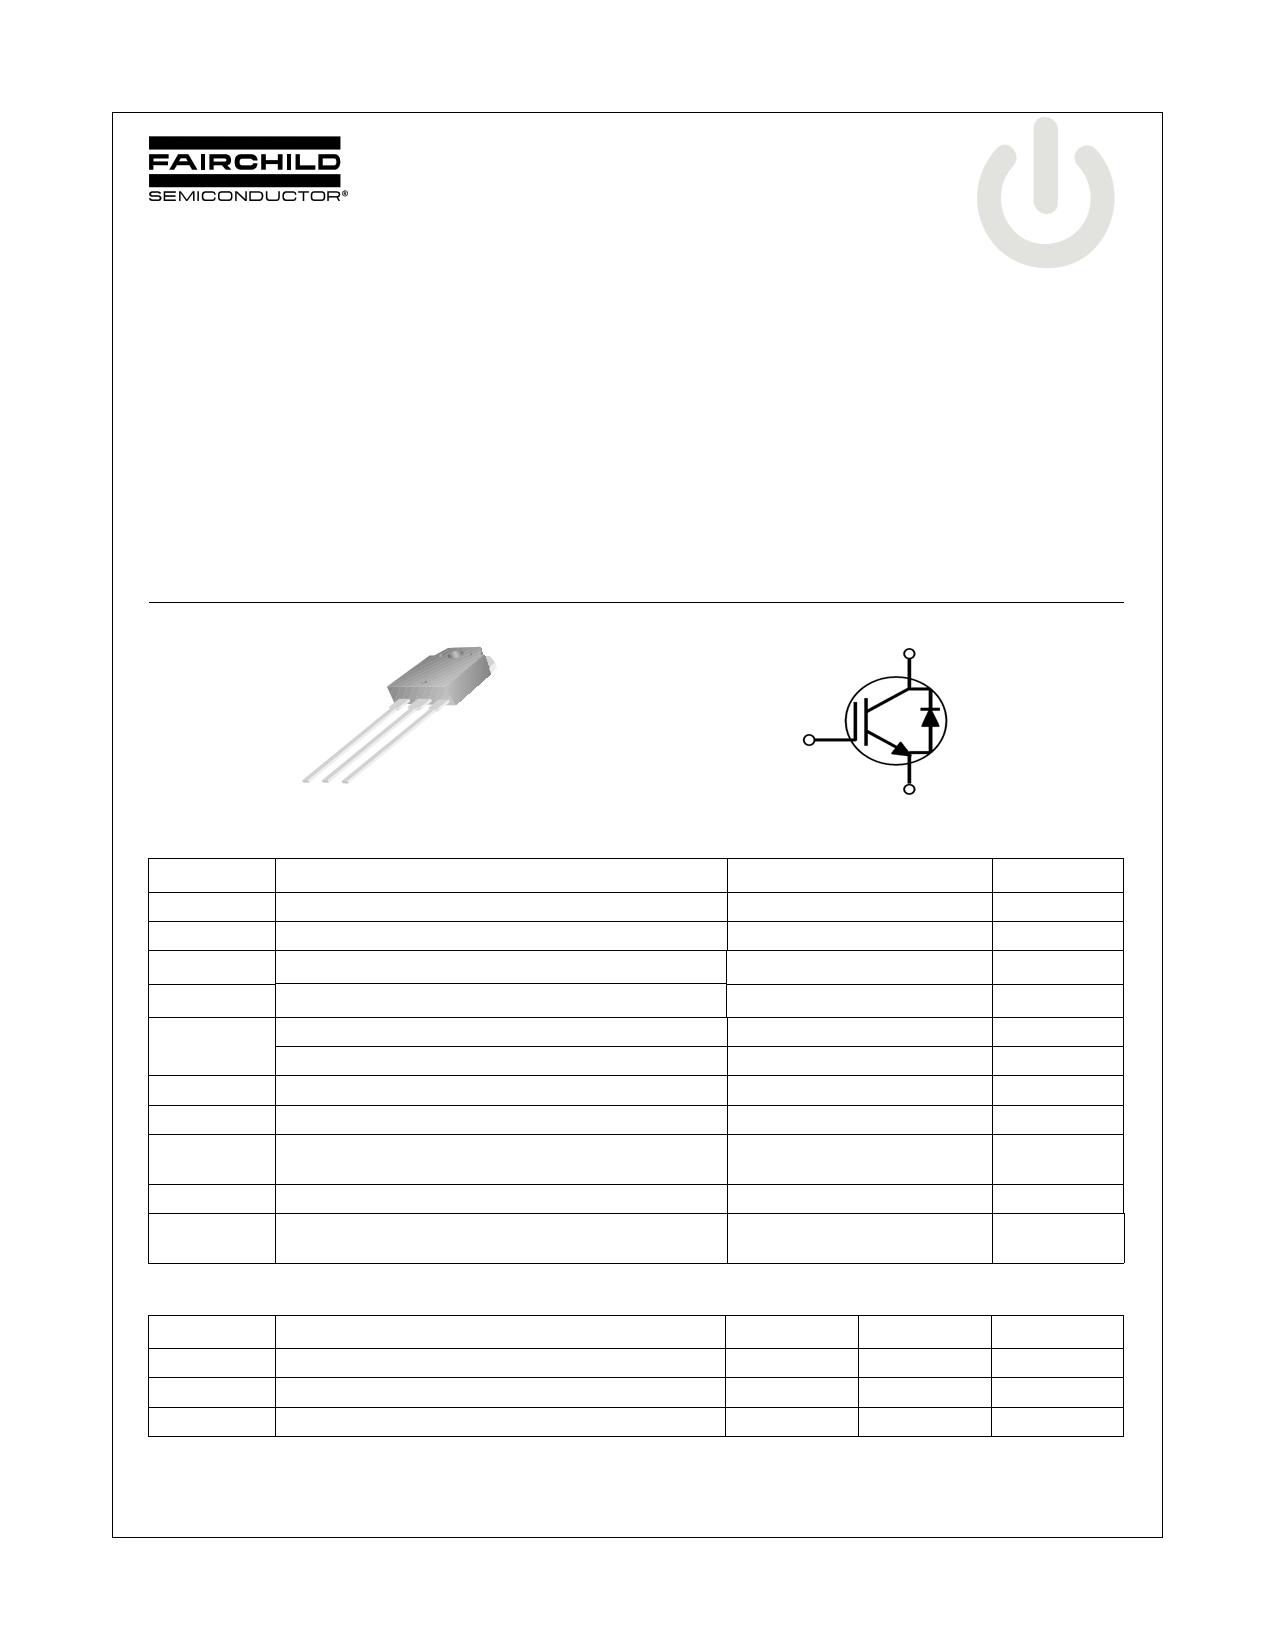 FGA70N33BTD datasheet, circuit